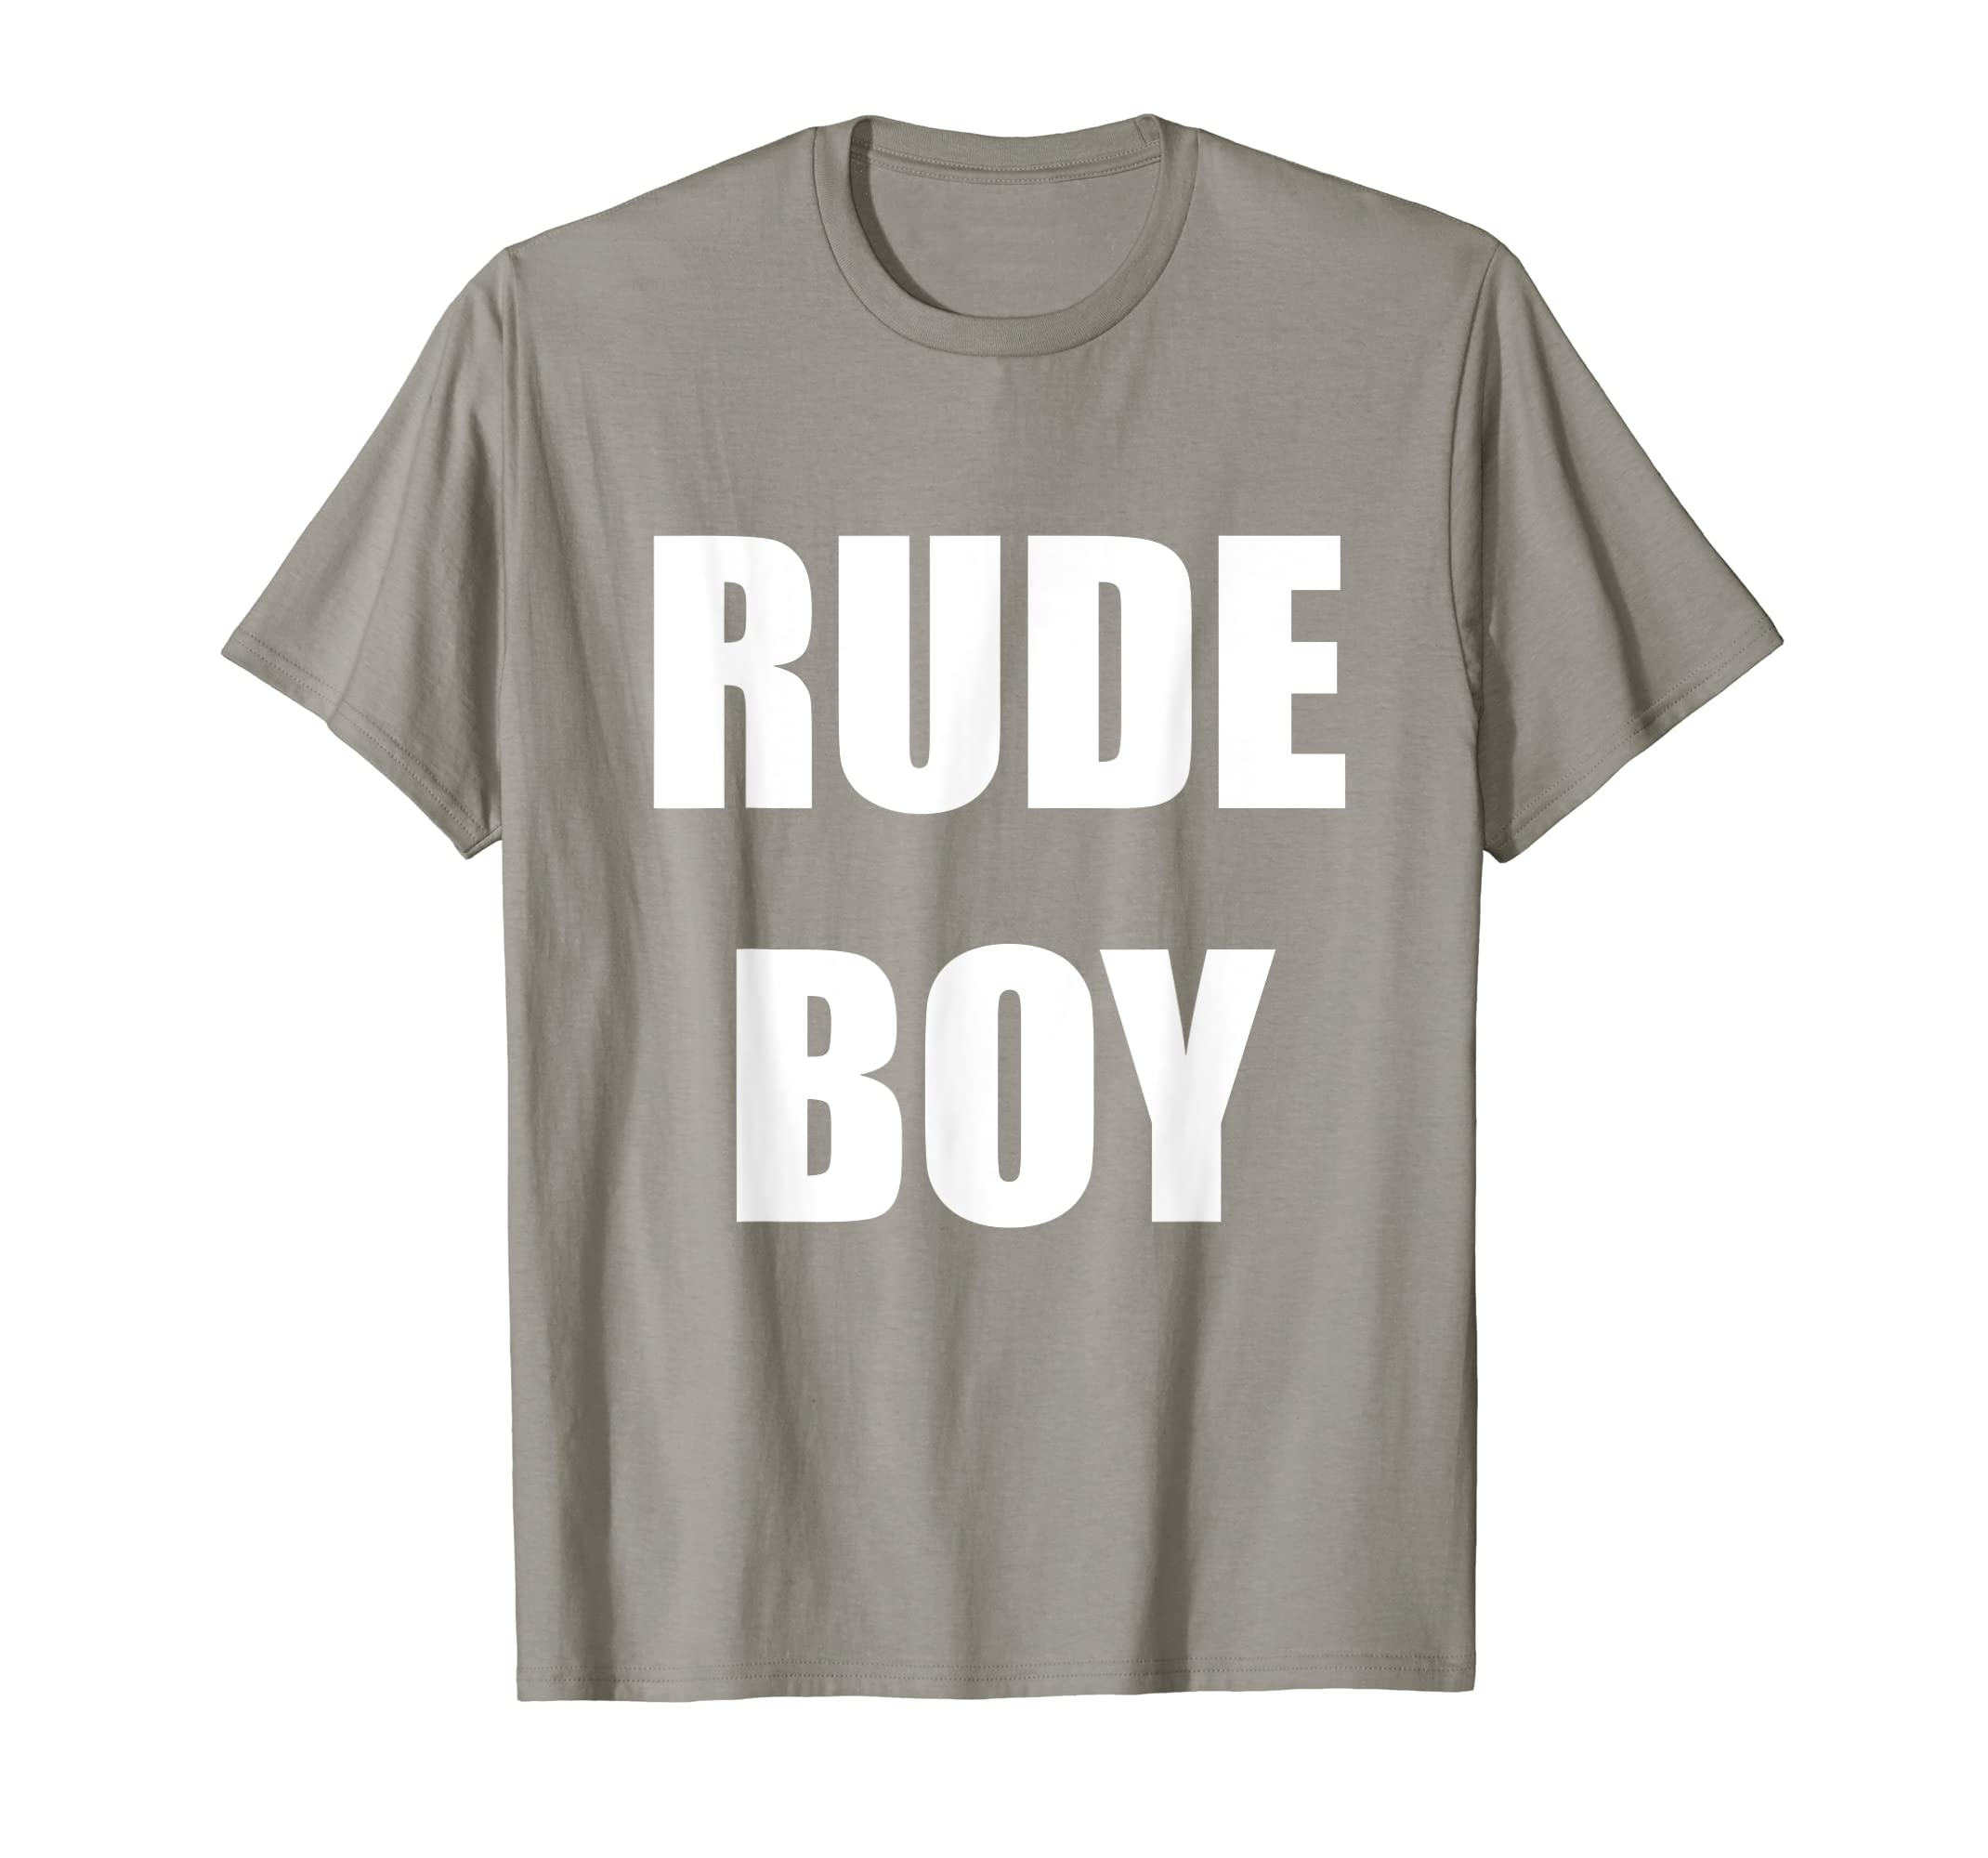 e1169bd12 Amazon.com: Rude Boy T-Shirt: Clothing